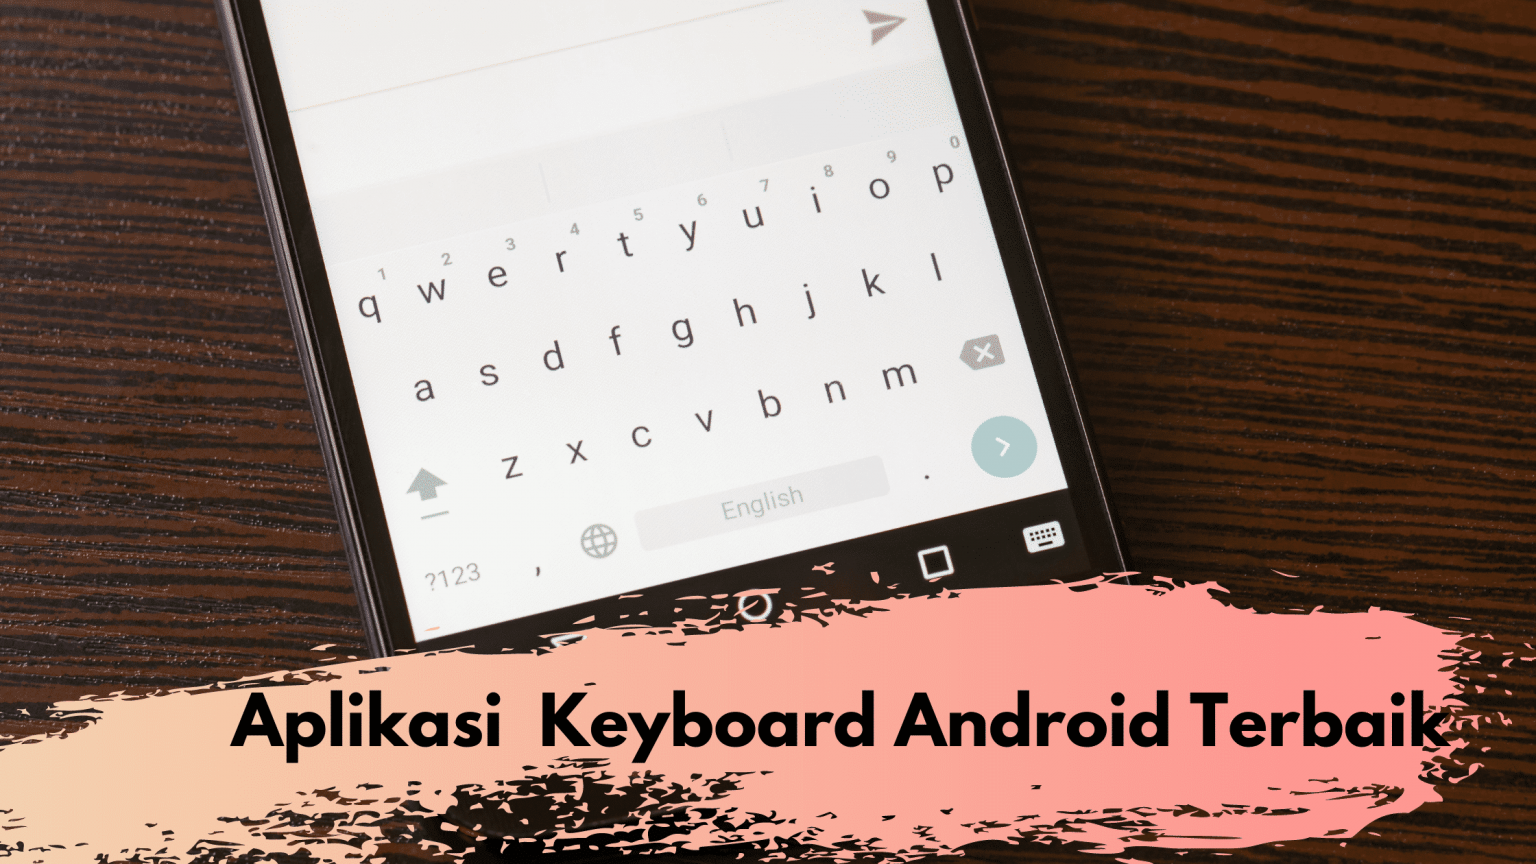 5 Aplikasi Keyboard Android Terbaik 2021 Wajib Anda Coba